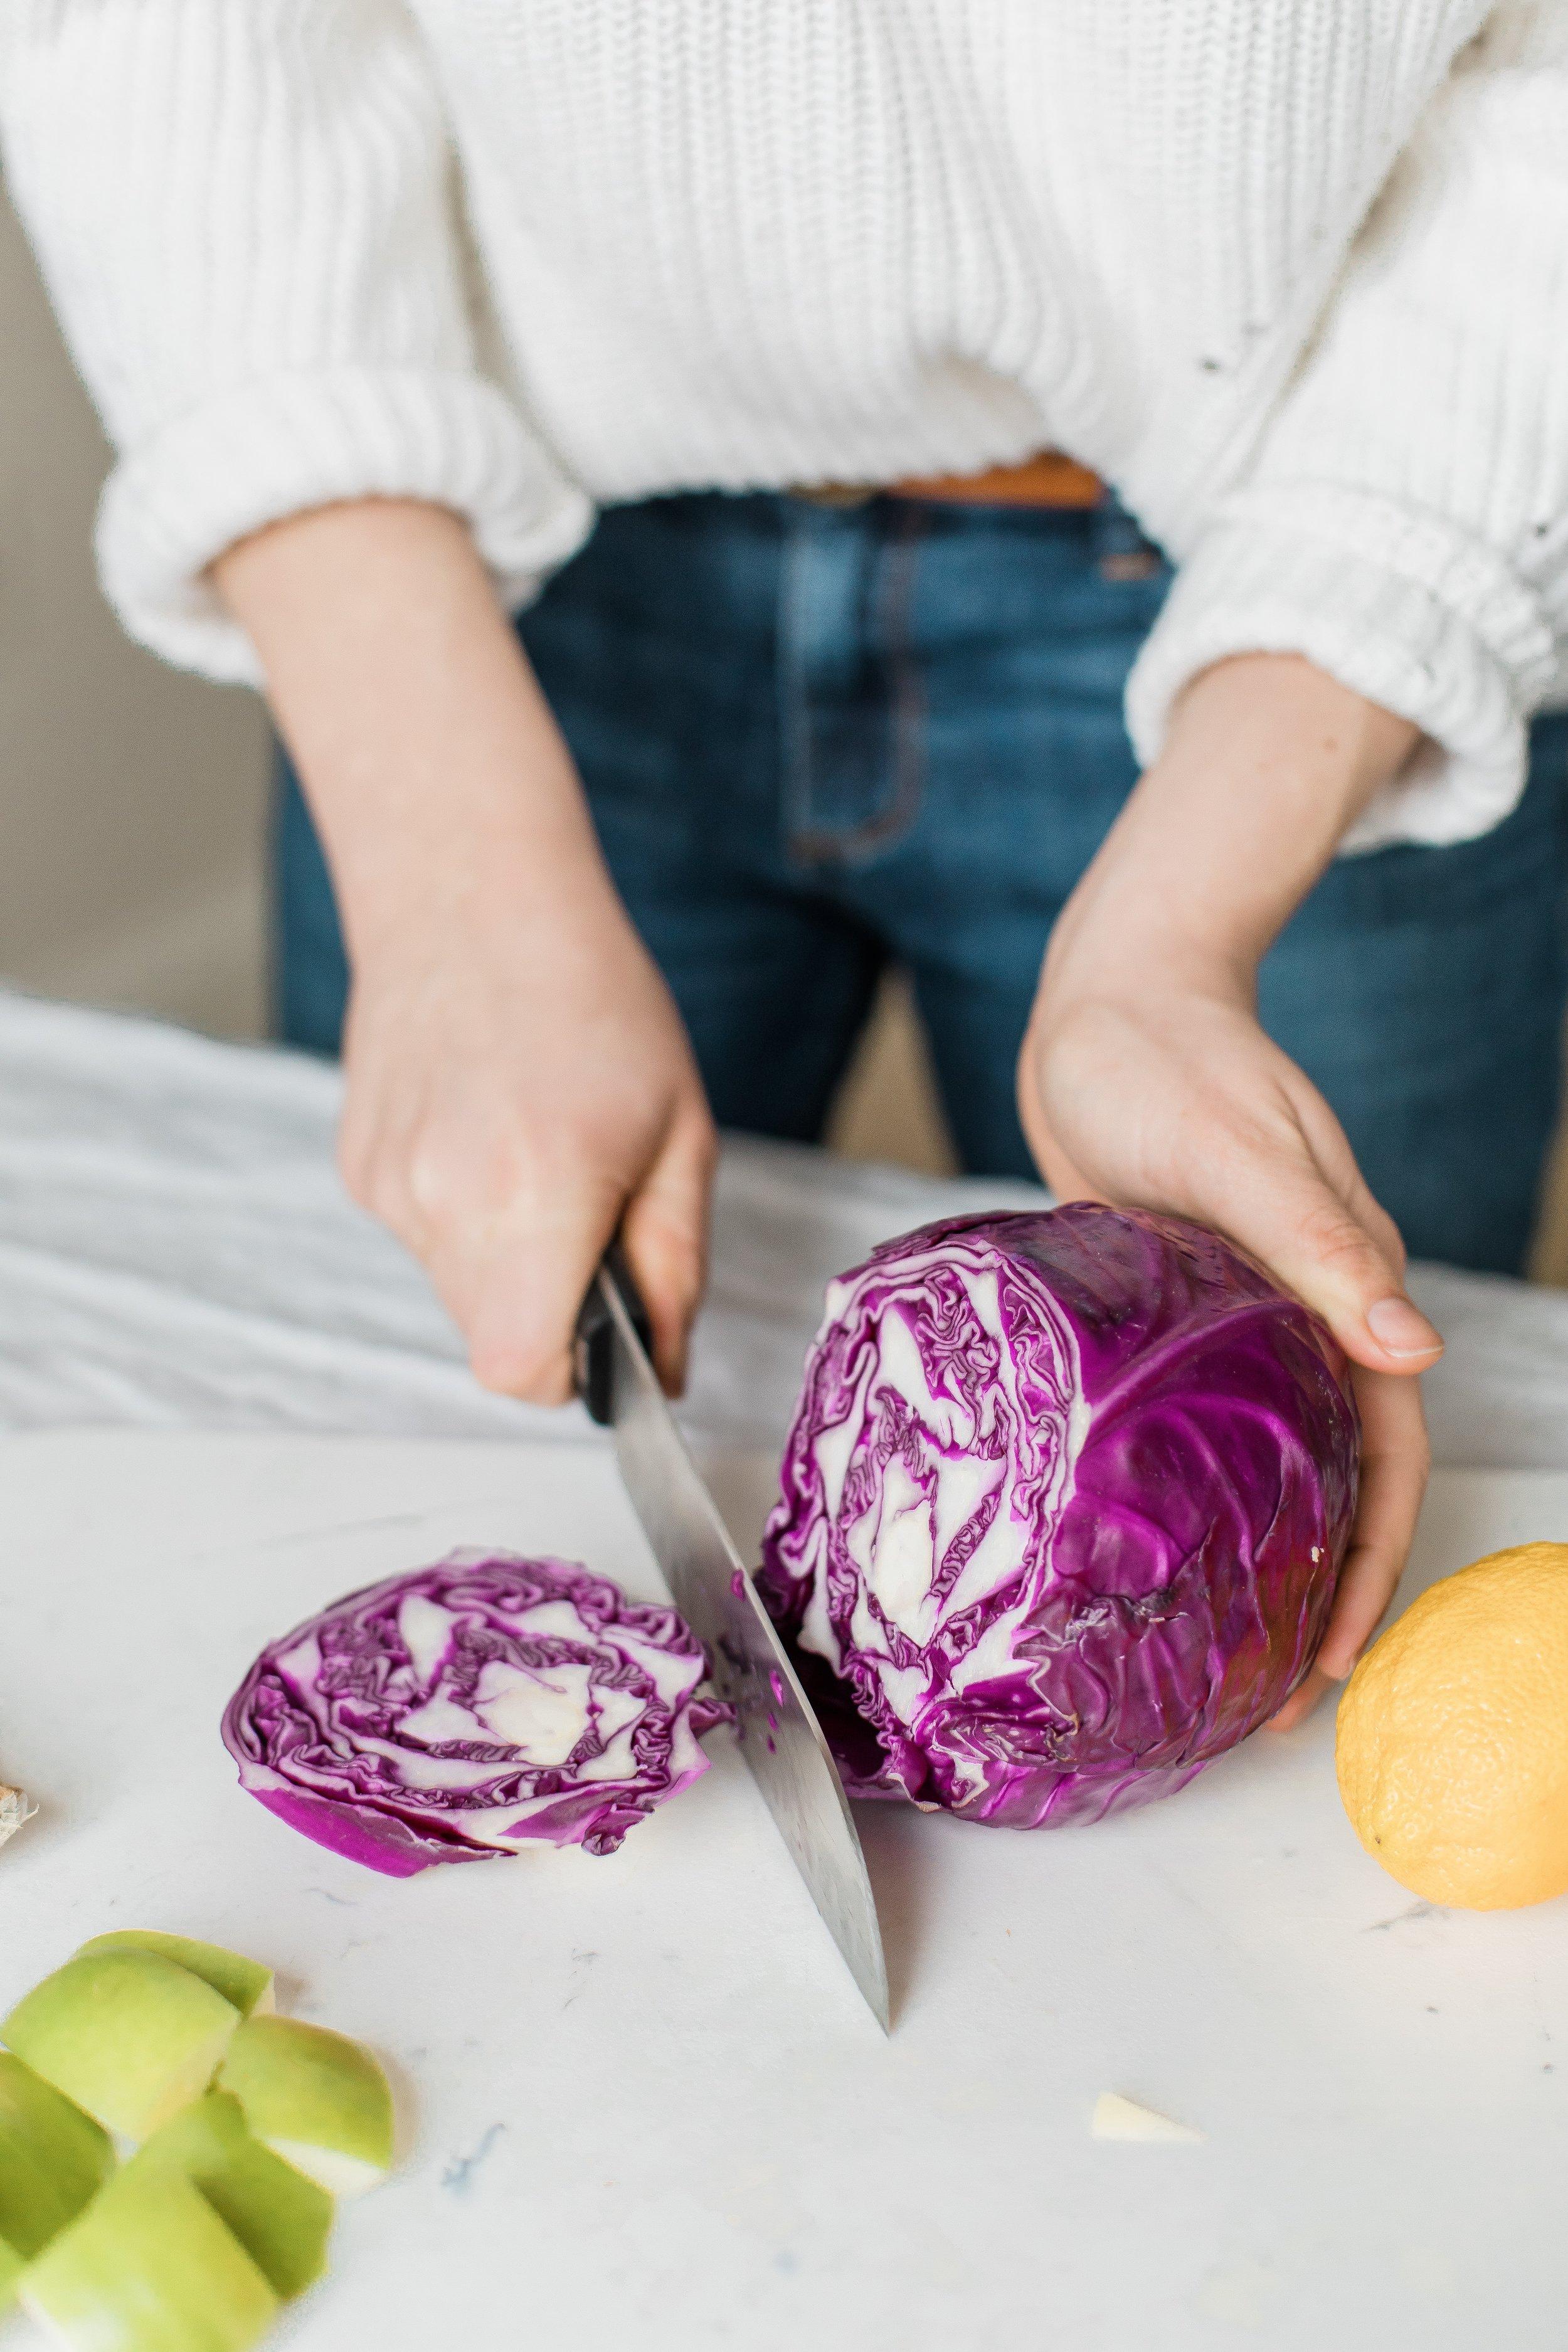 Cruciferous veggies like cabbage help the body to detoxify.